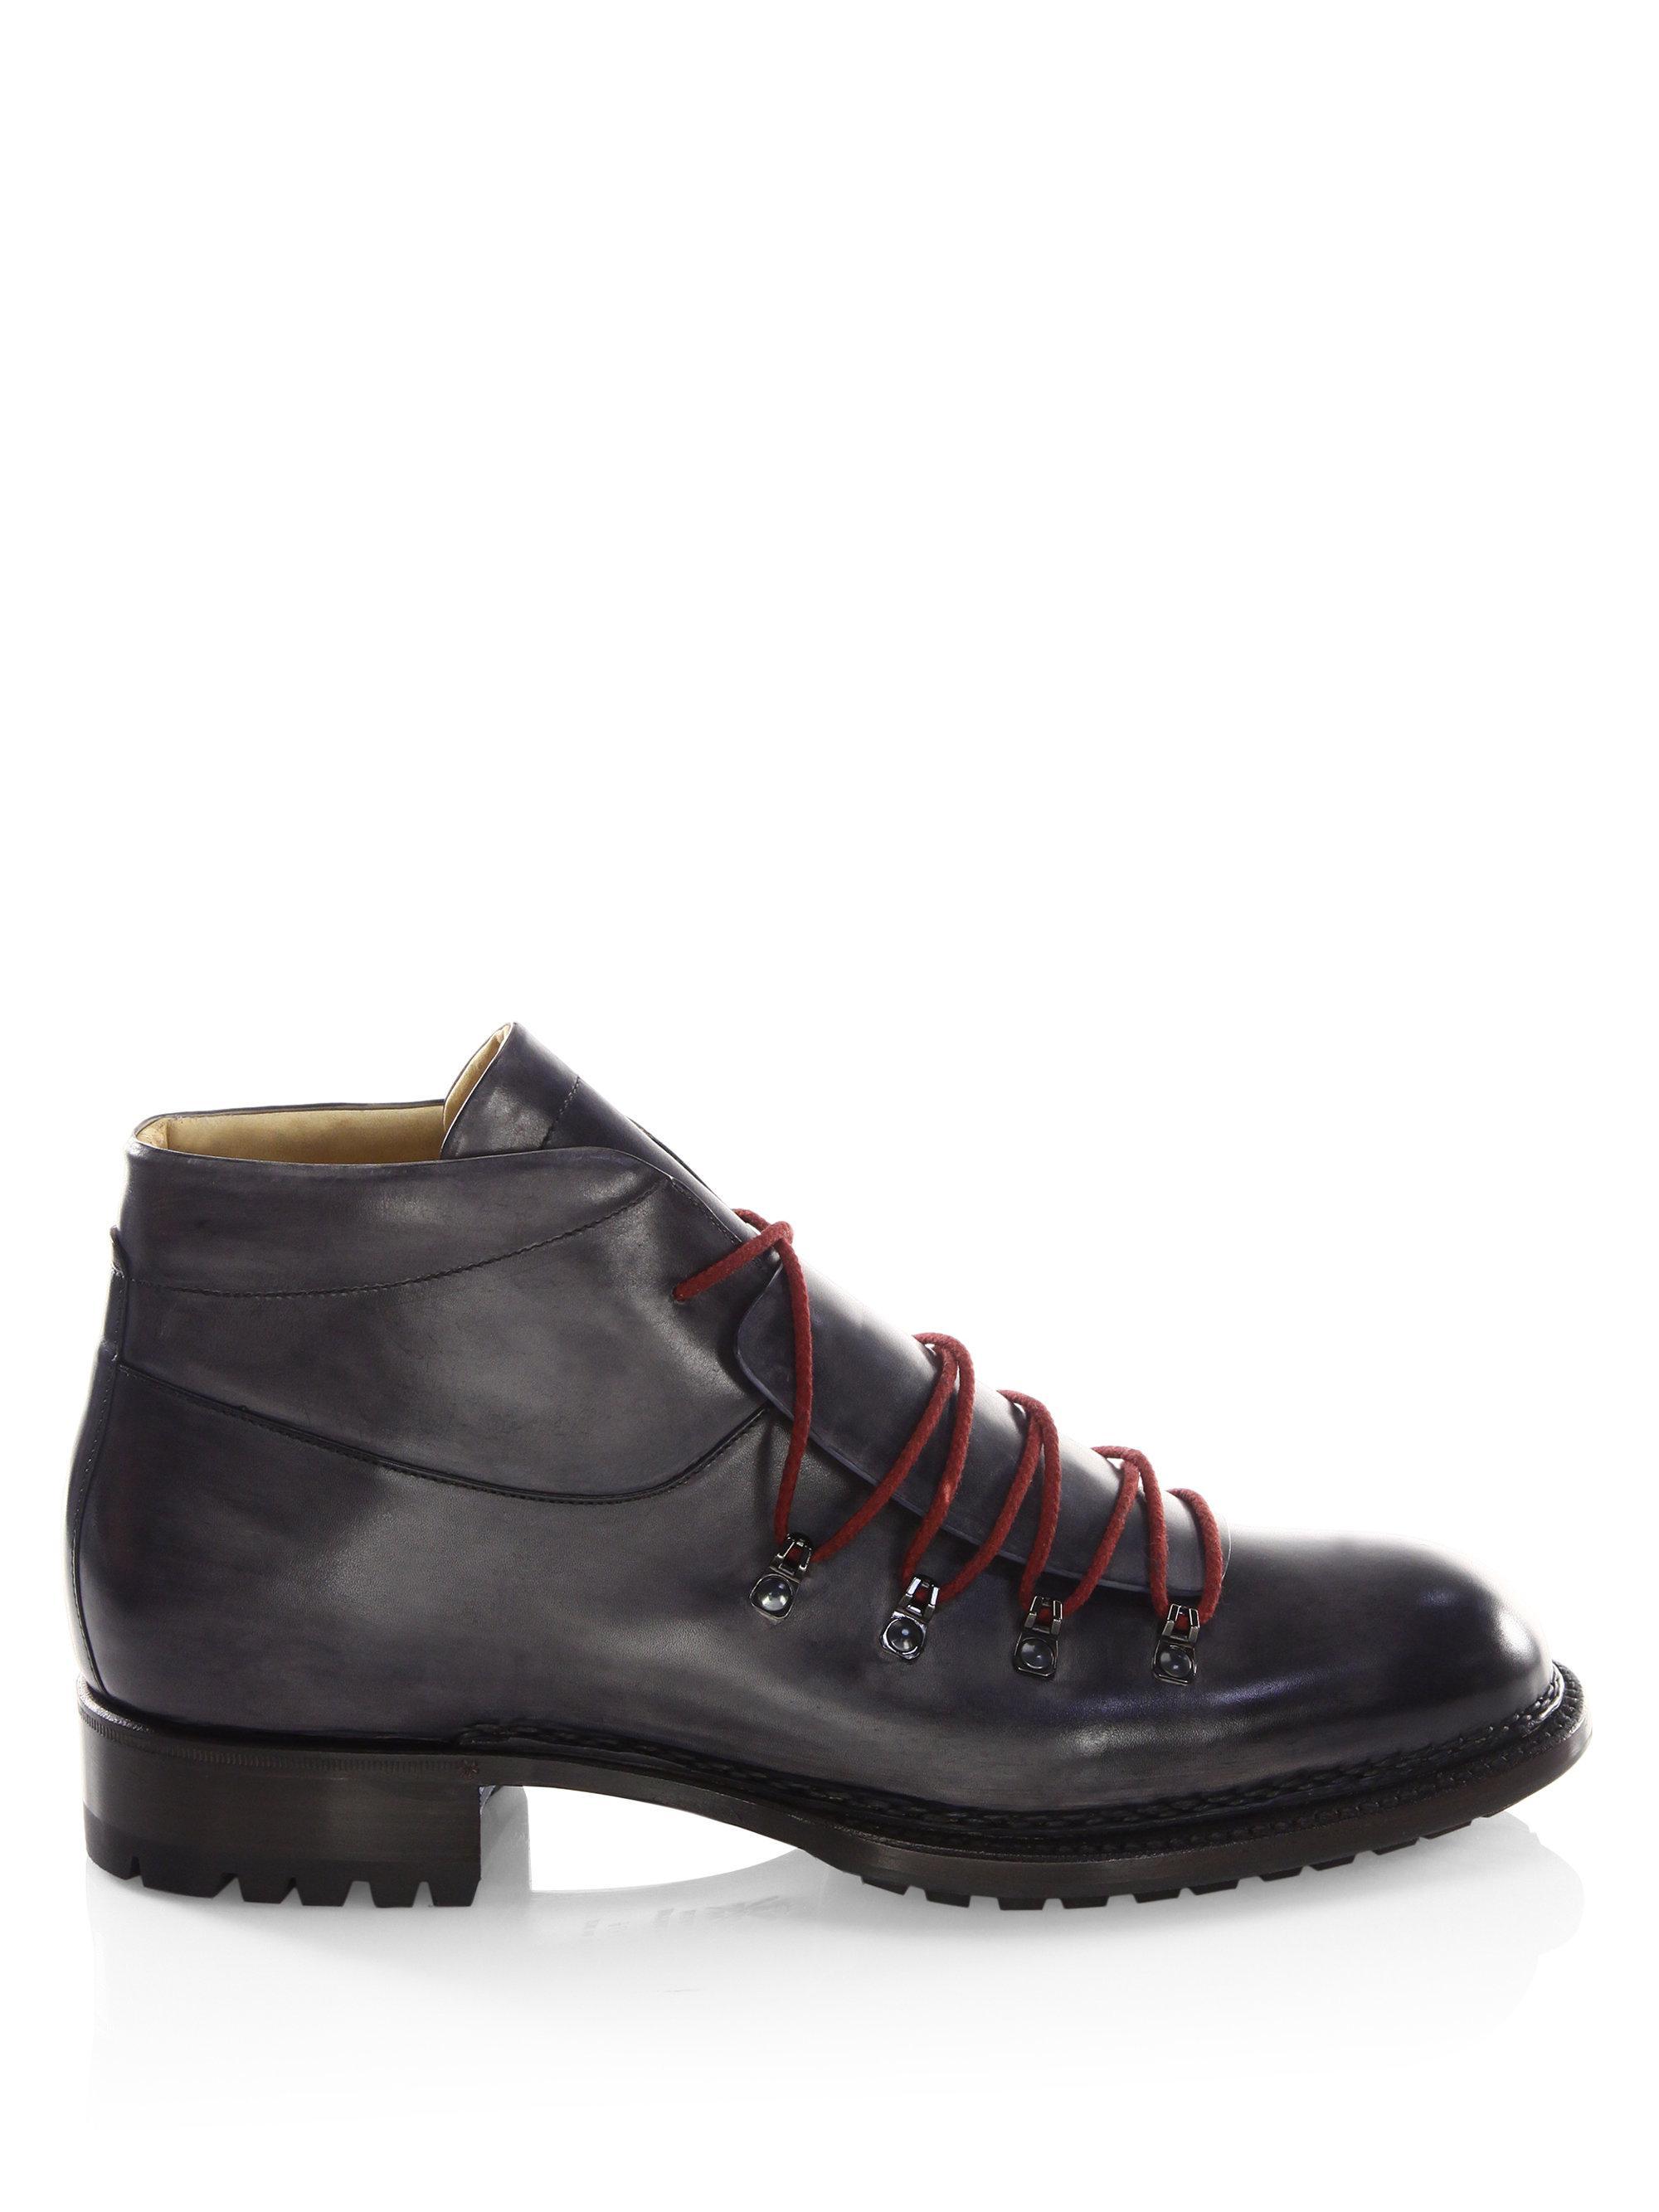 SUTOR MANTELLASSI Boris Master Leather Hiking Boots mIFjP6H